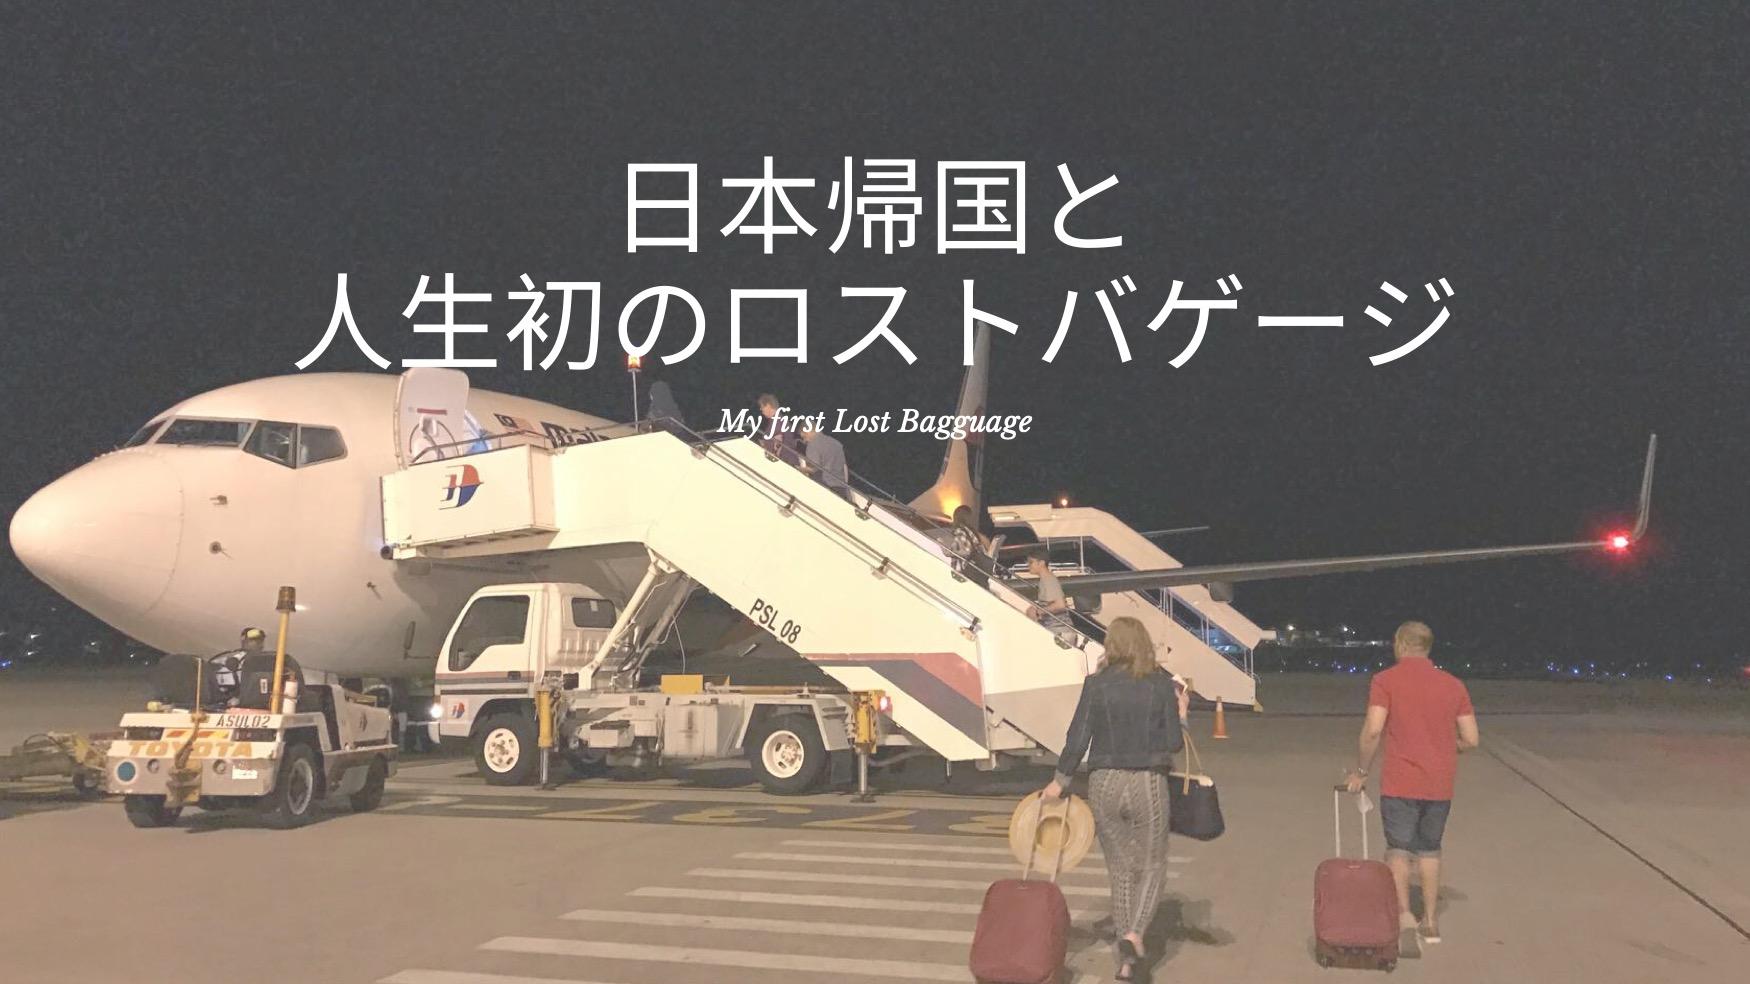 blog日本帰国と人生初のロストバゲージ